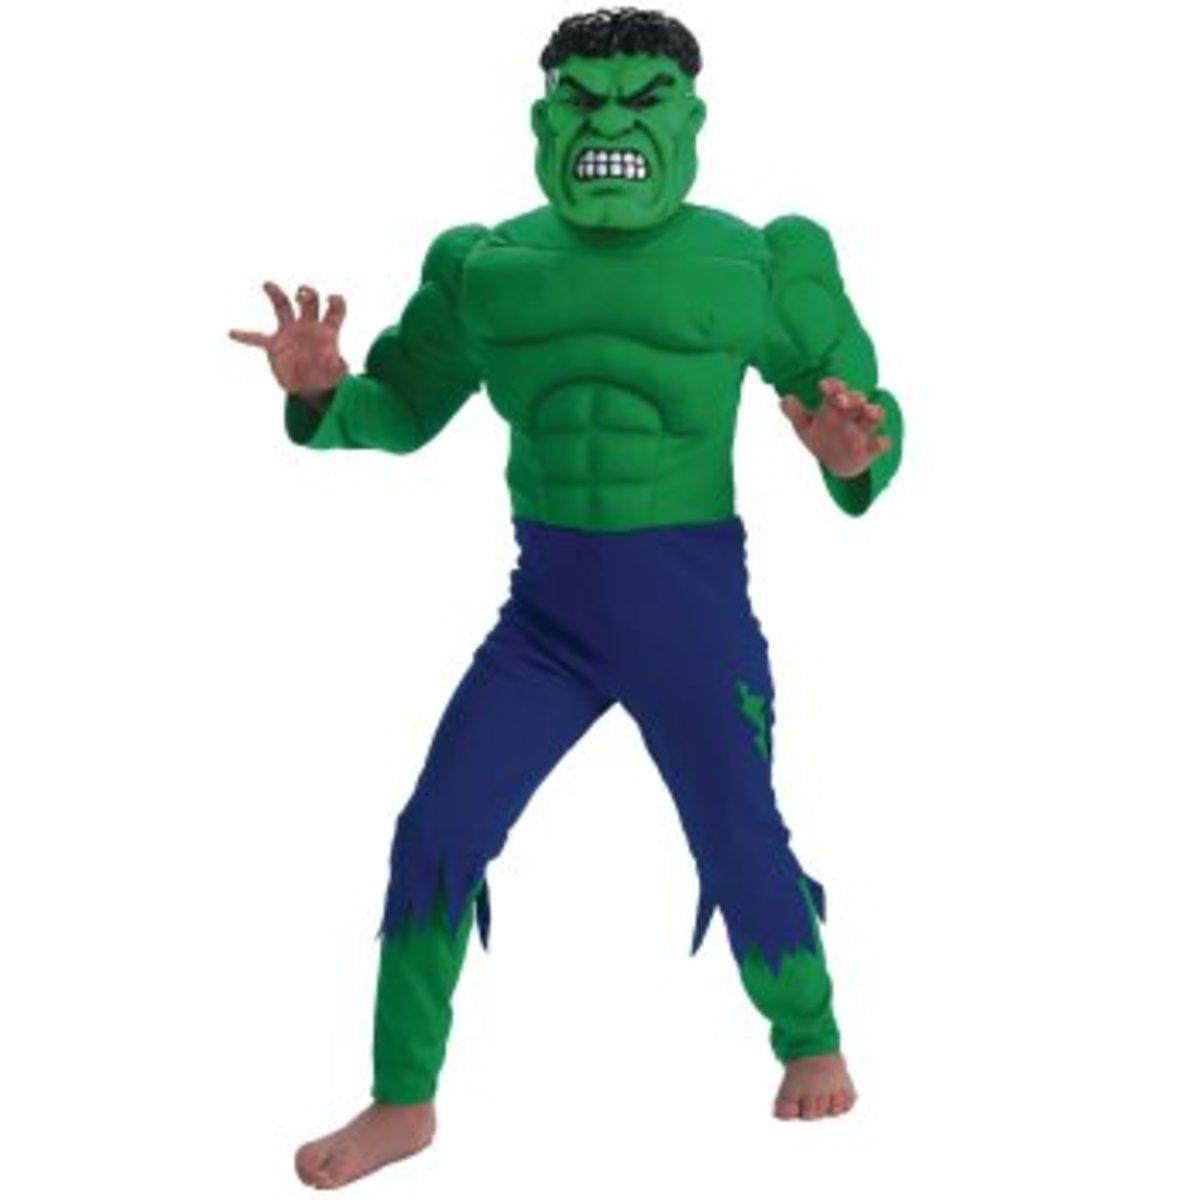 Hulk 2003 movie costume